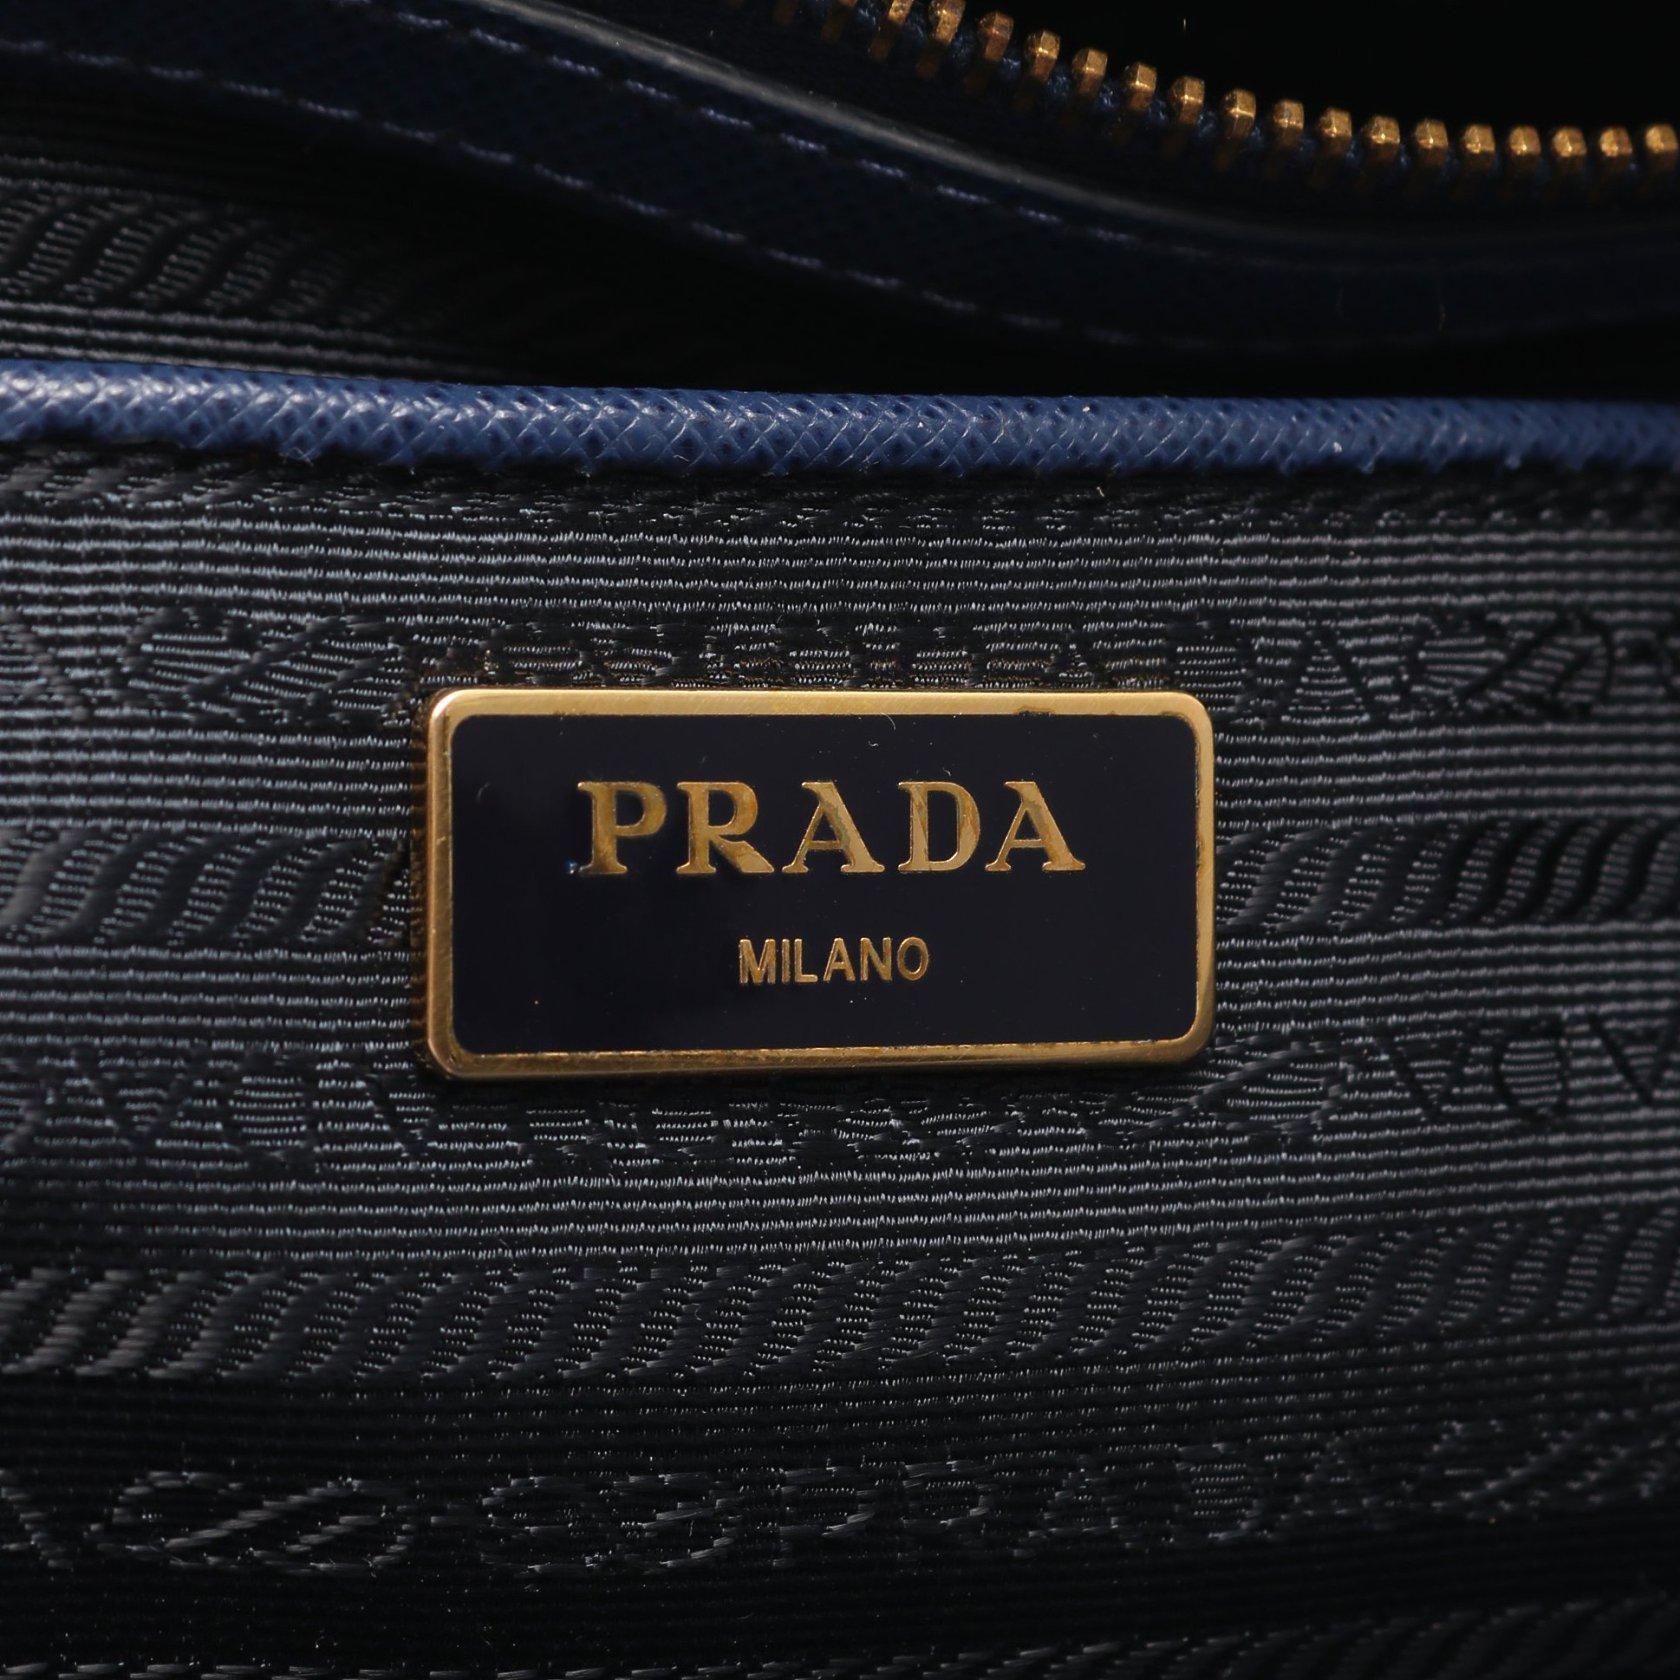 PRADA・バッグ・ガレリア トートバッグ サフィアーノレザー ブルー